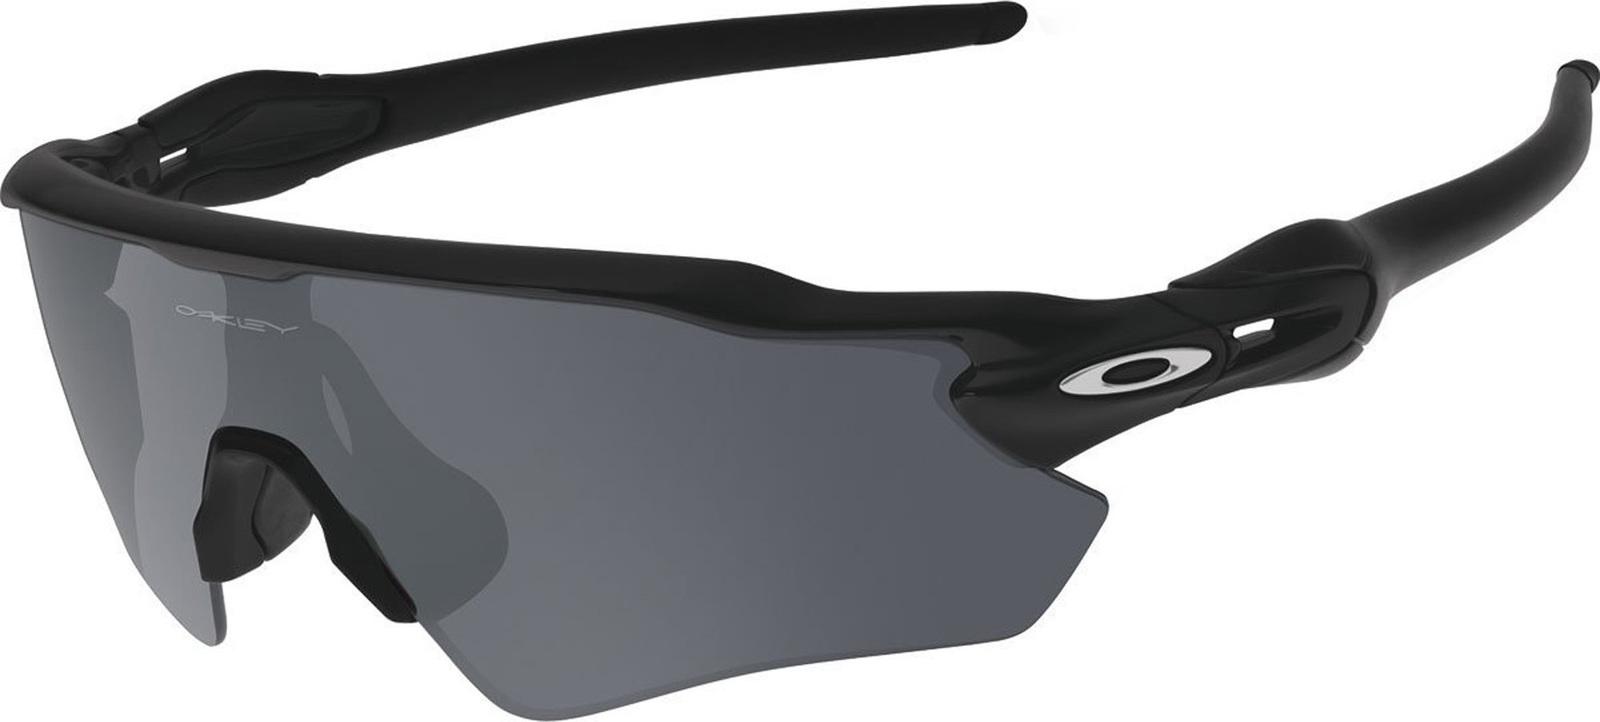 93fc6d2922 Ανδρικά Γυαλιά Ηλίου Oakley - Skroutz.gr